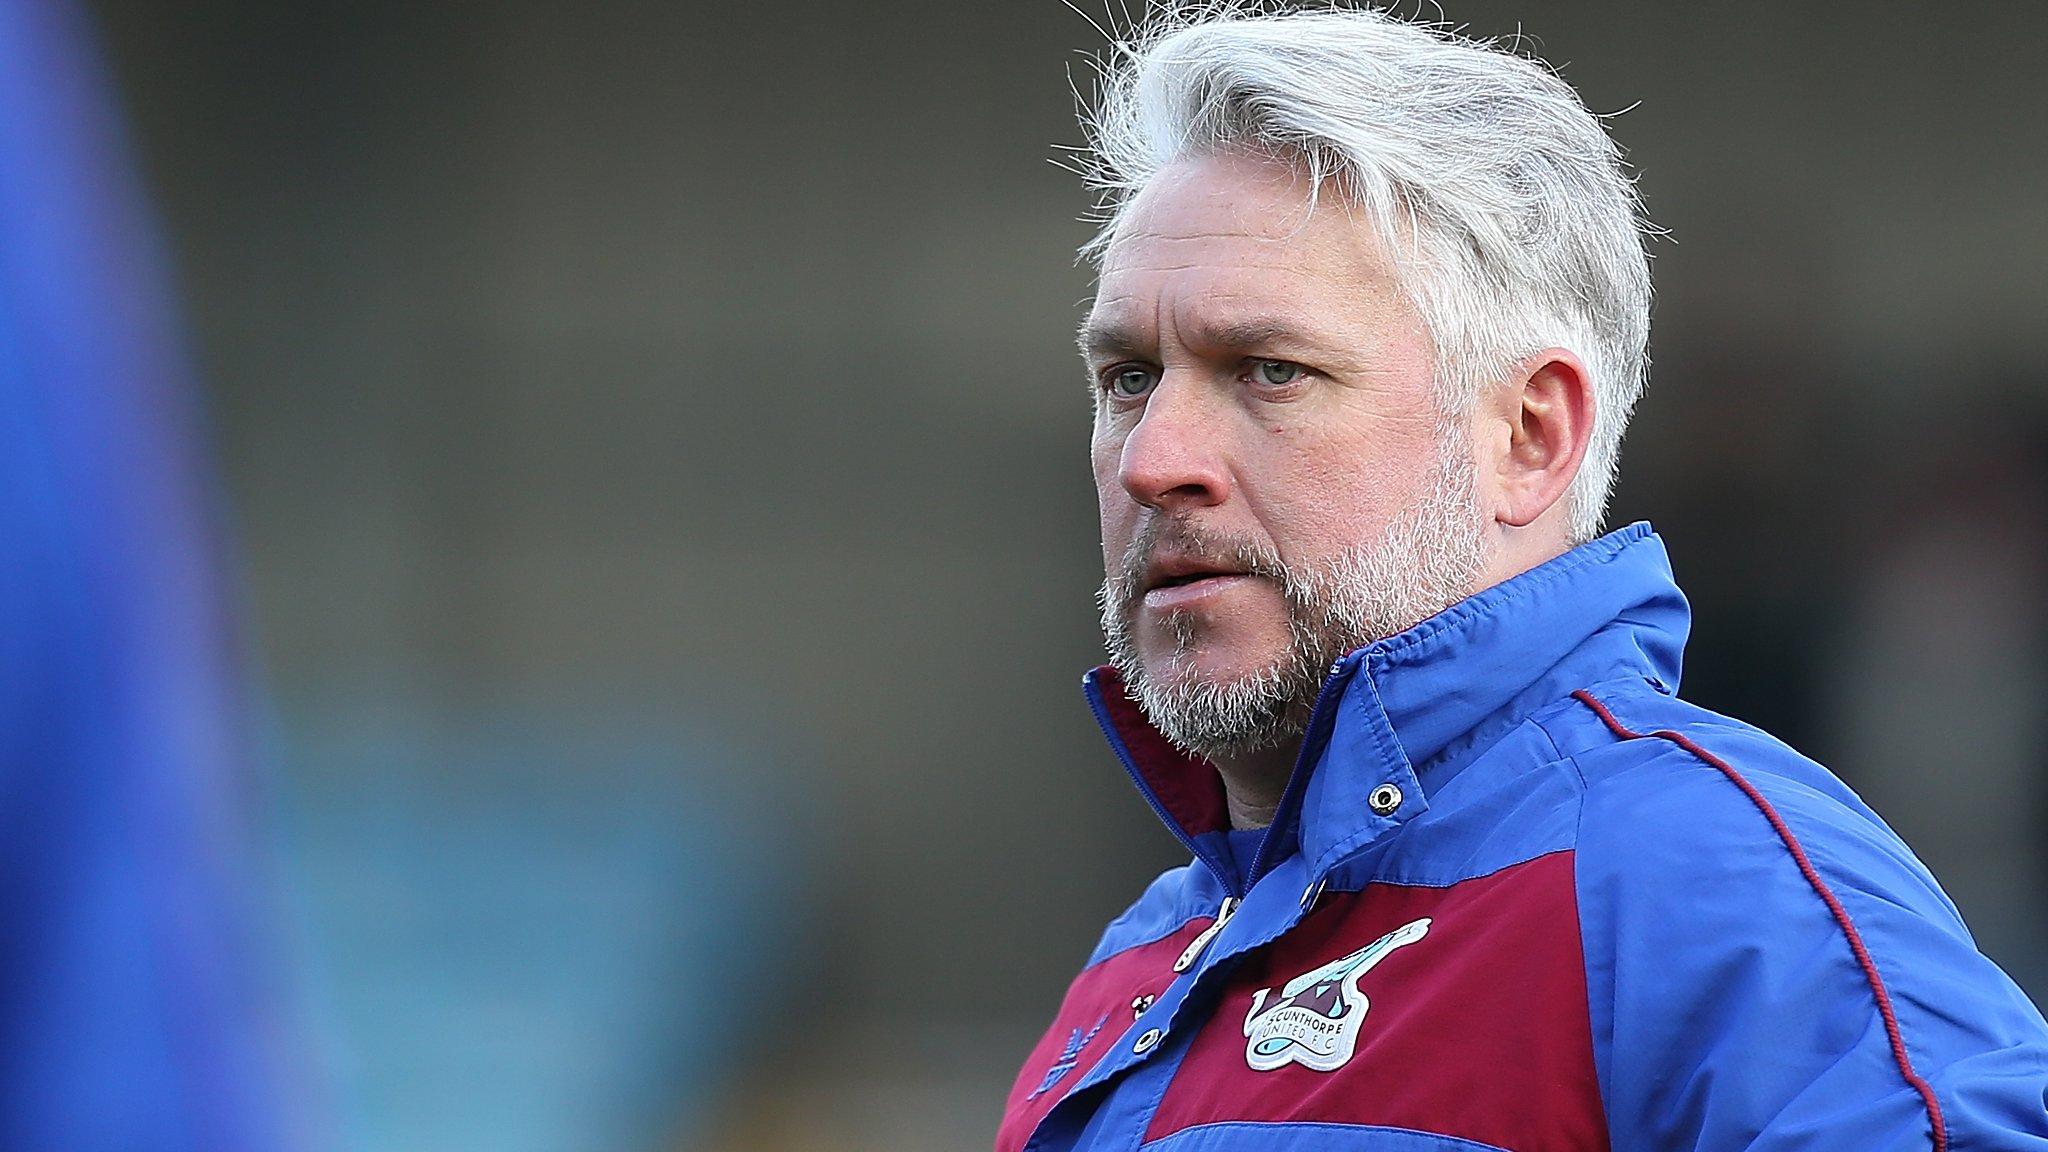 Scunthorpe sack manager Daws four games into season